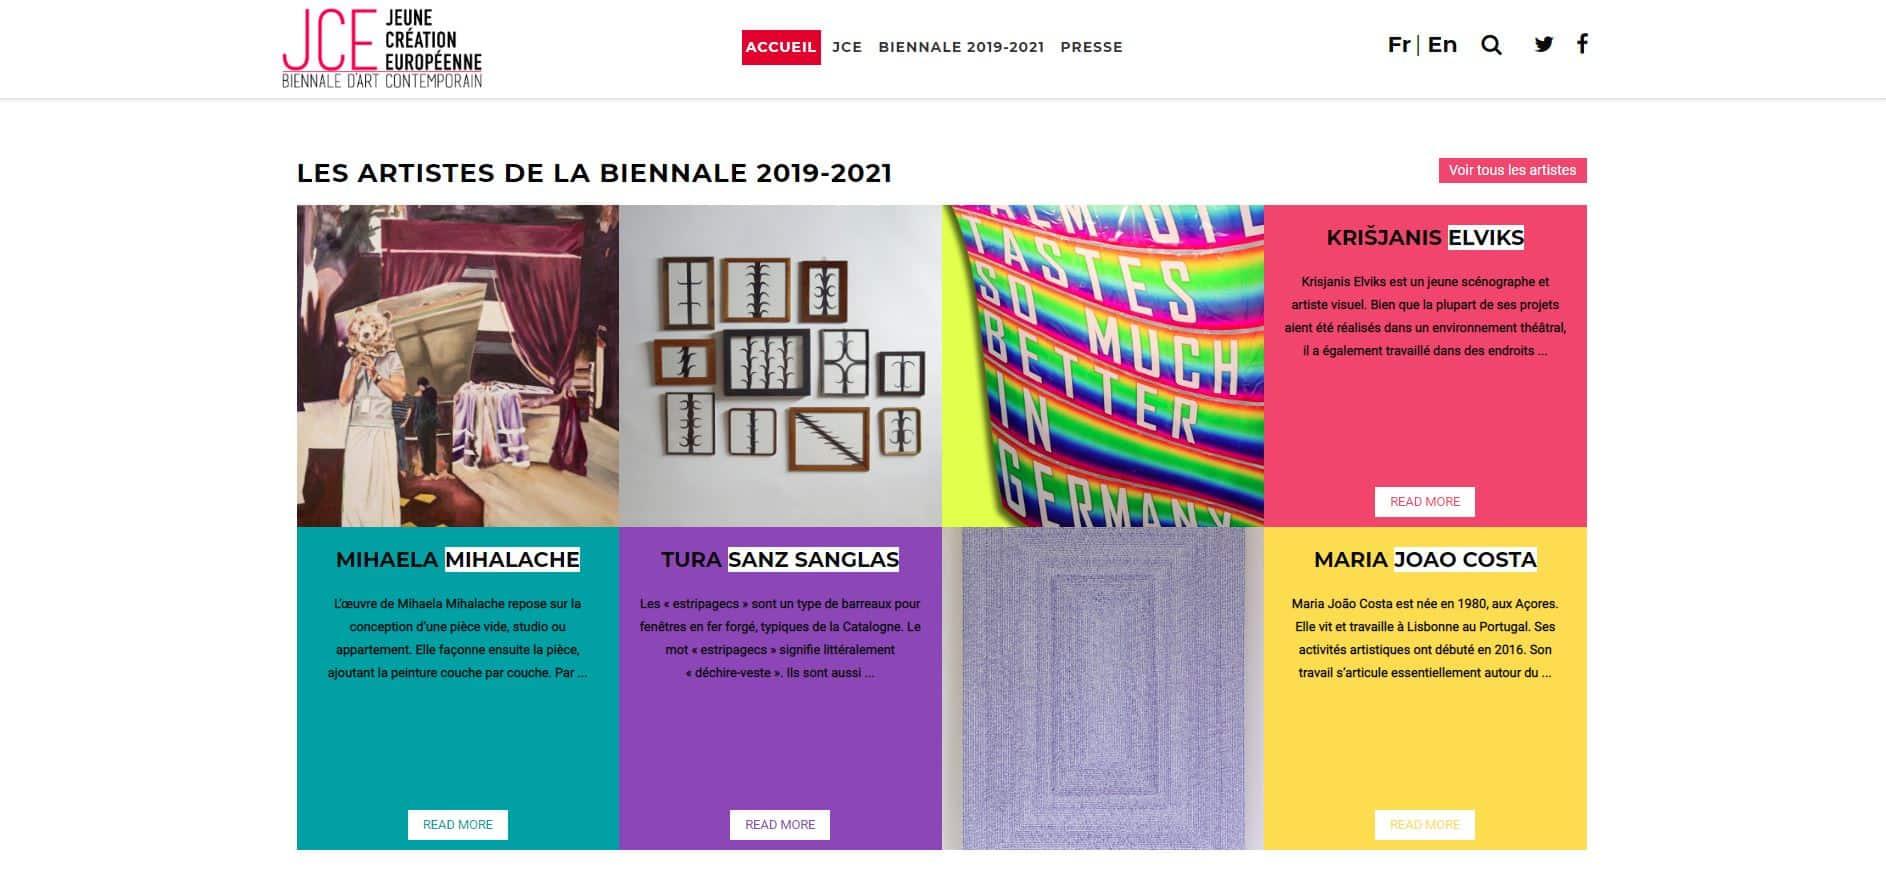 Création du Site Jeune Création Européenne